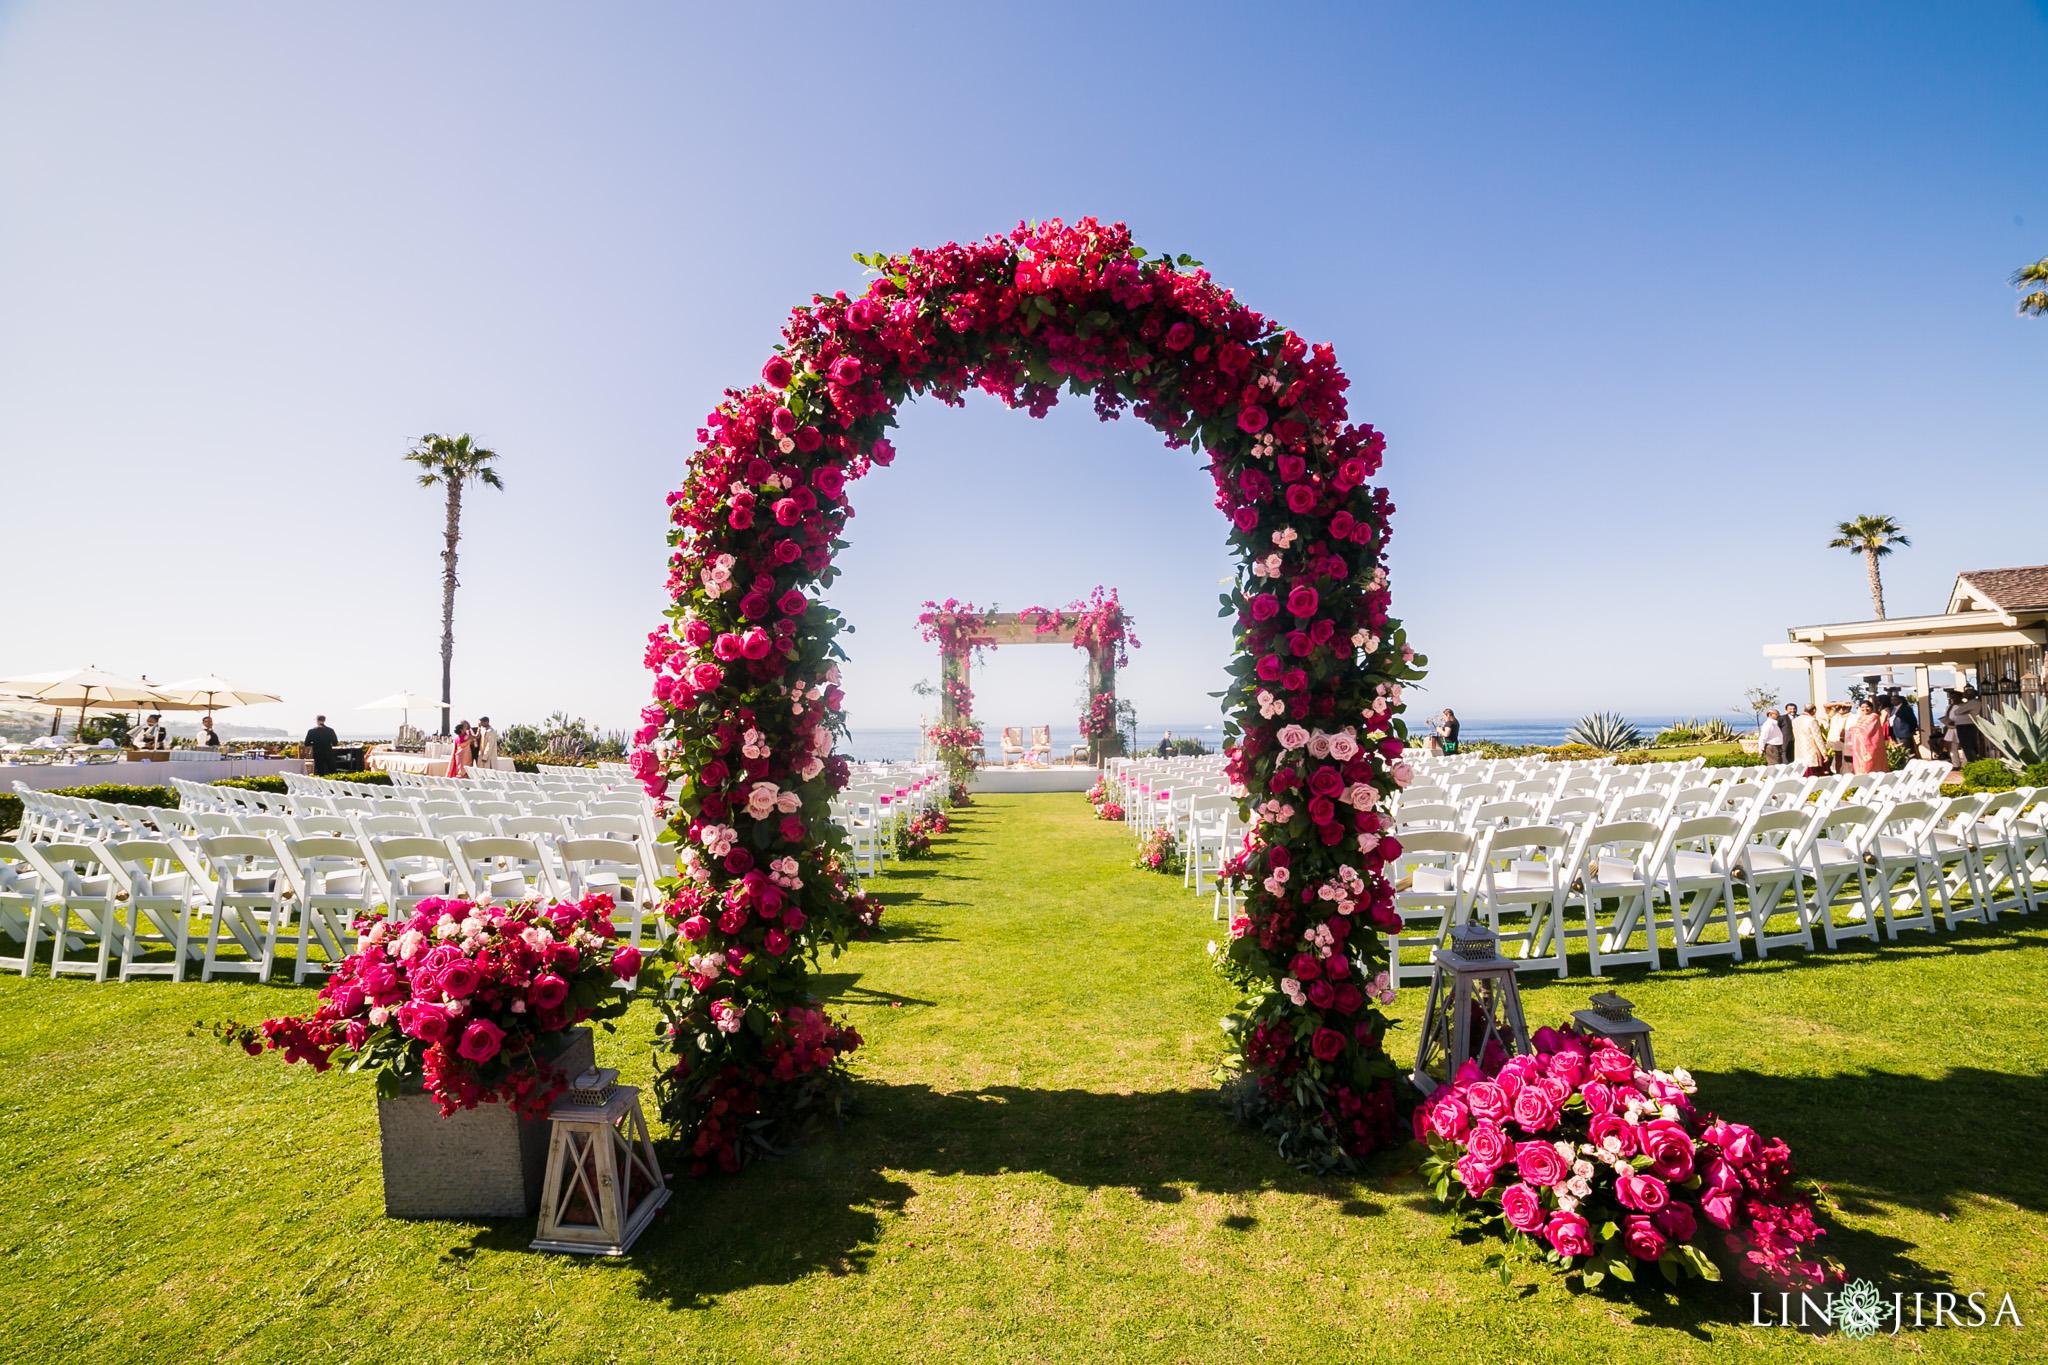 18 montage laguna beach indian wedding photography - wedding venues in laguna beach